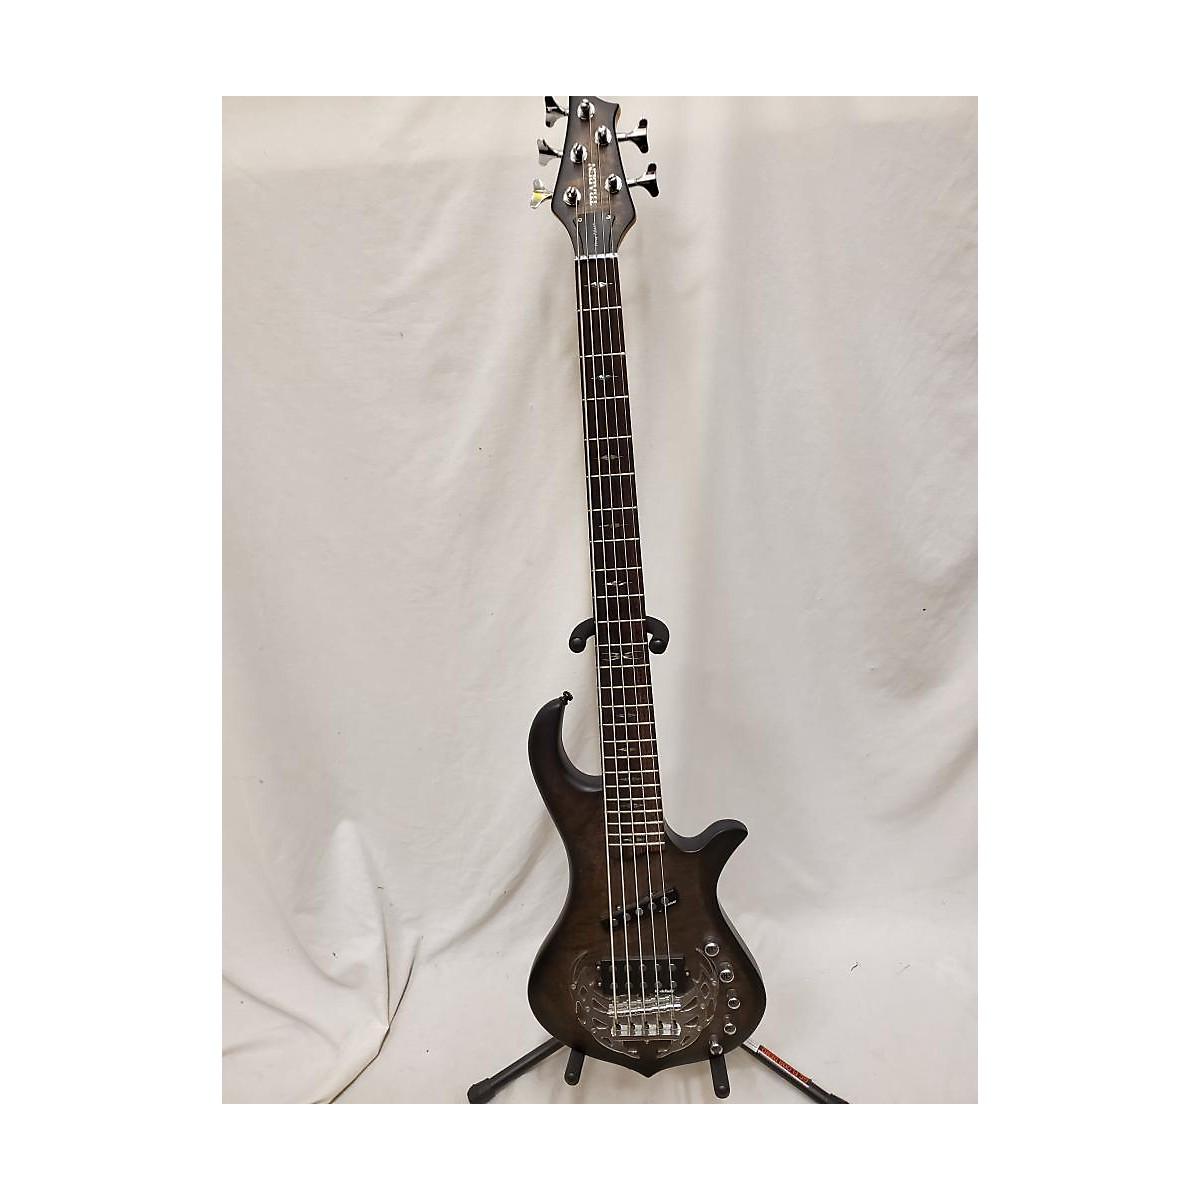 Traben Array Attack 5 String Electric Bass Guitar